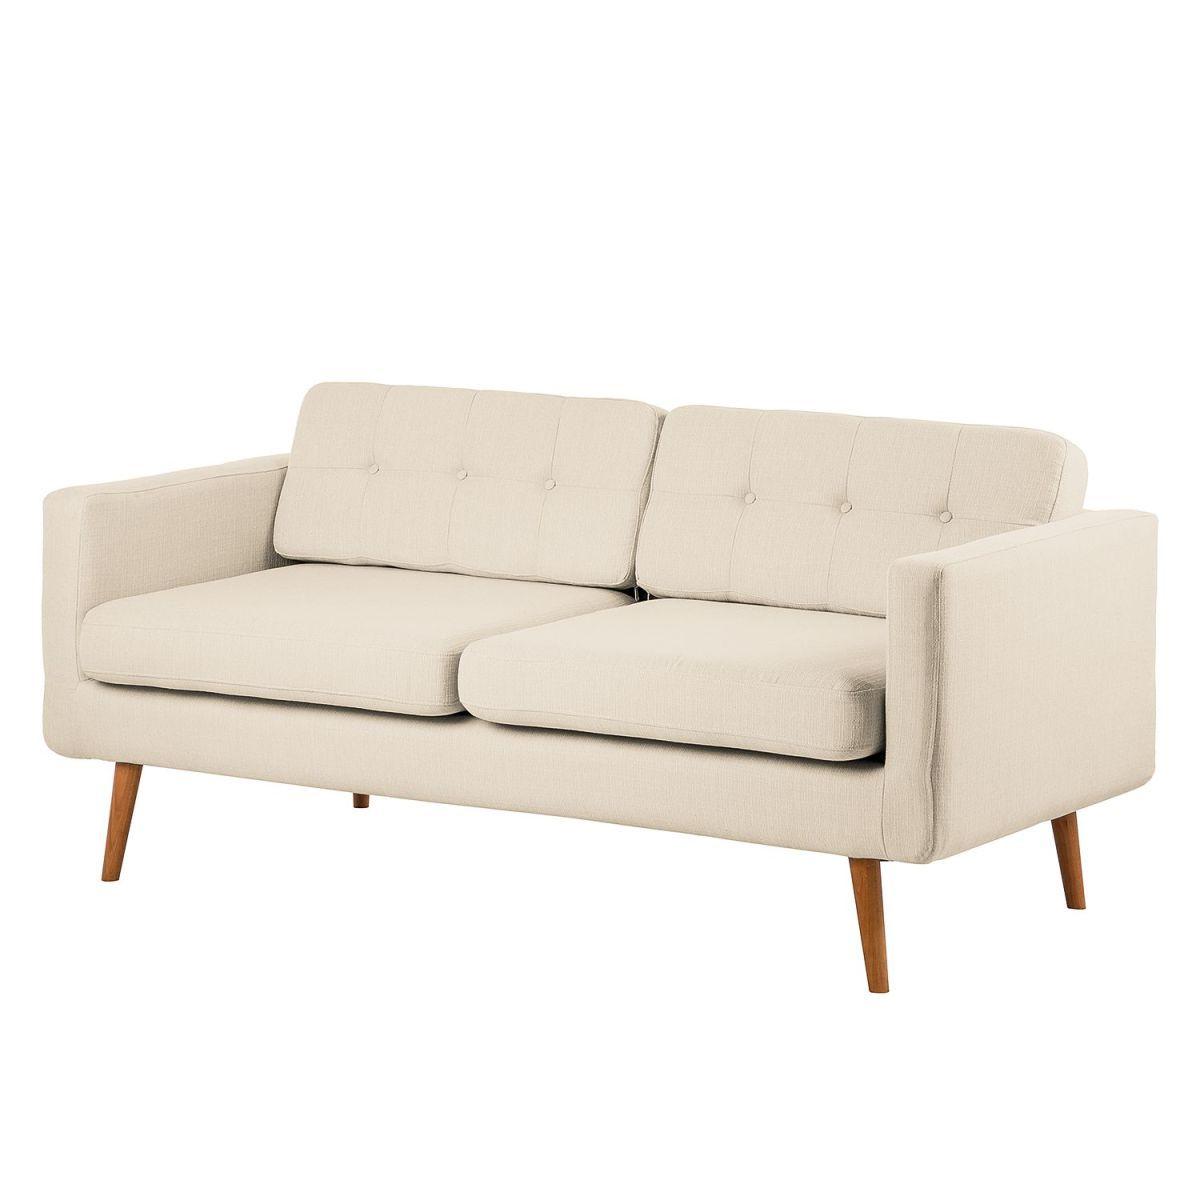 Sofa Croom I 3 Sitzer Webstoff Jetzt Bestellen Unter Https Moebel Ladendirekt De Wohnzimmer Sofas 2 Und 3 Sitzer Sofas Sofa Sofas Sofa Mit Relaxfunktion